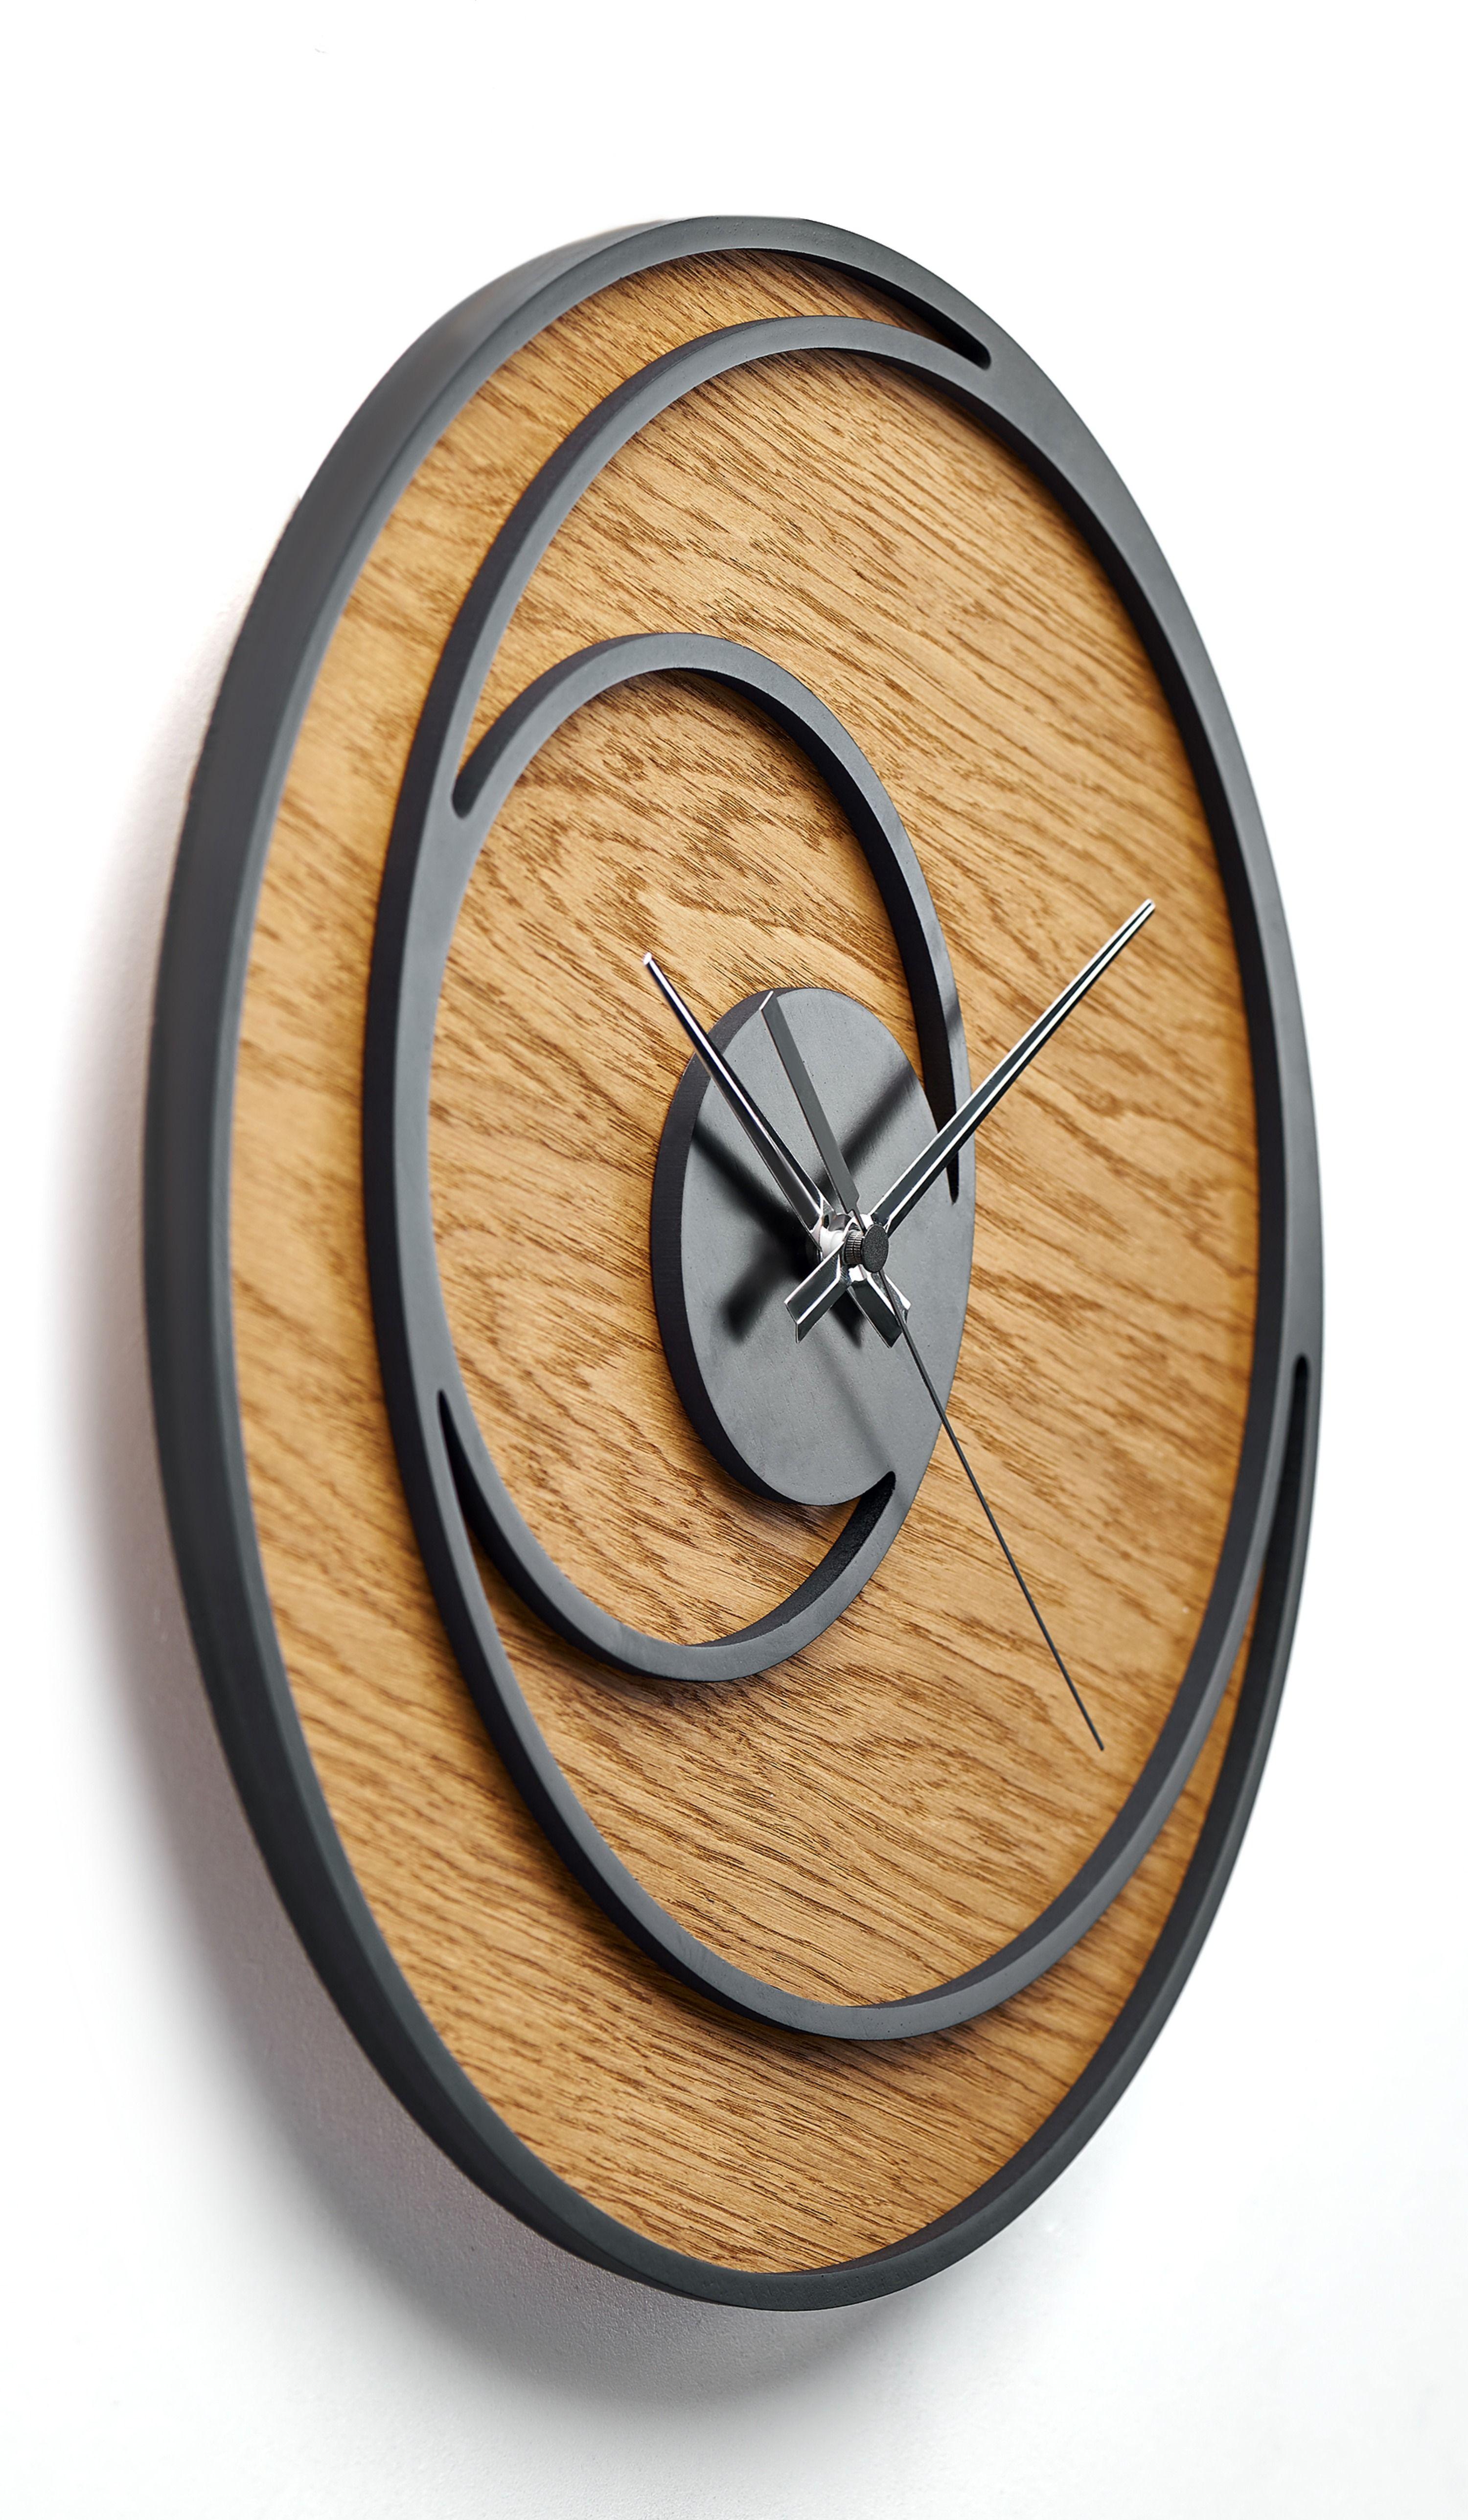 Wall Clock Modern Nursery Wall Clock Rustic Wall Clock Wooden Wall